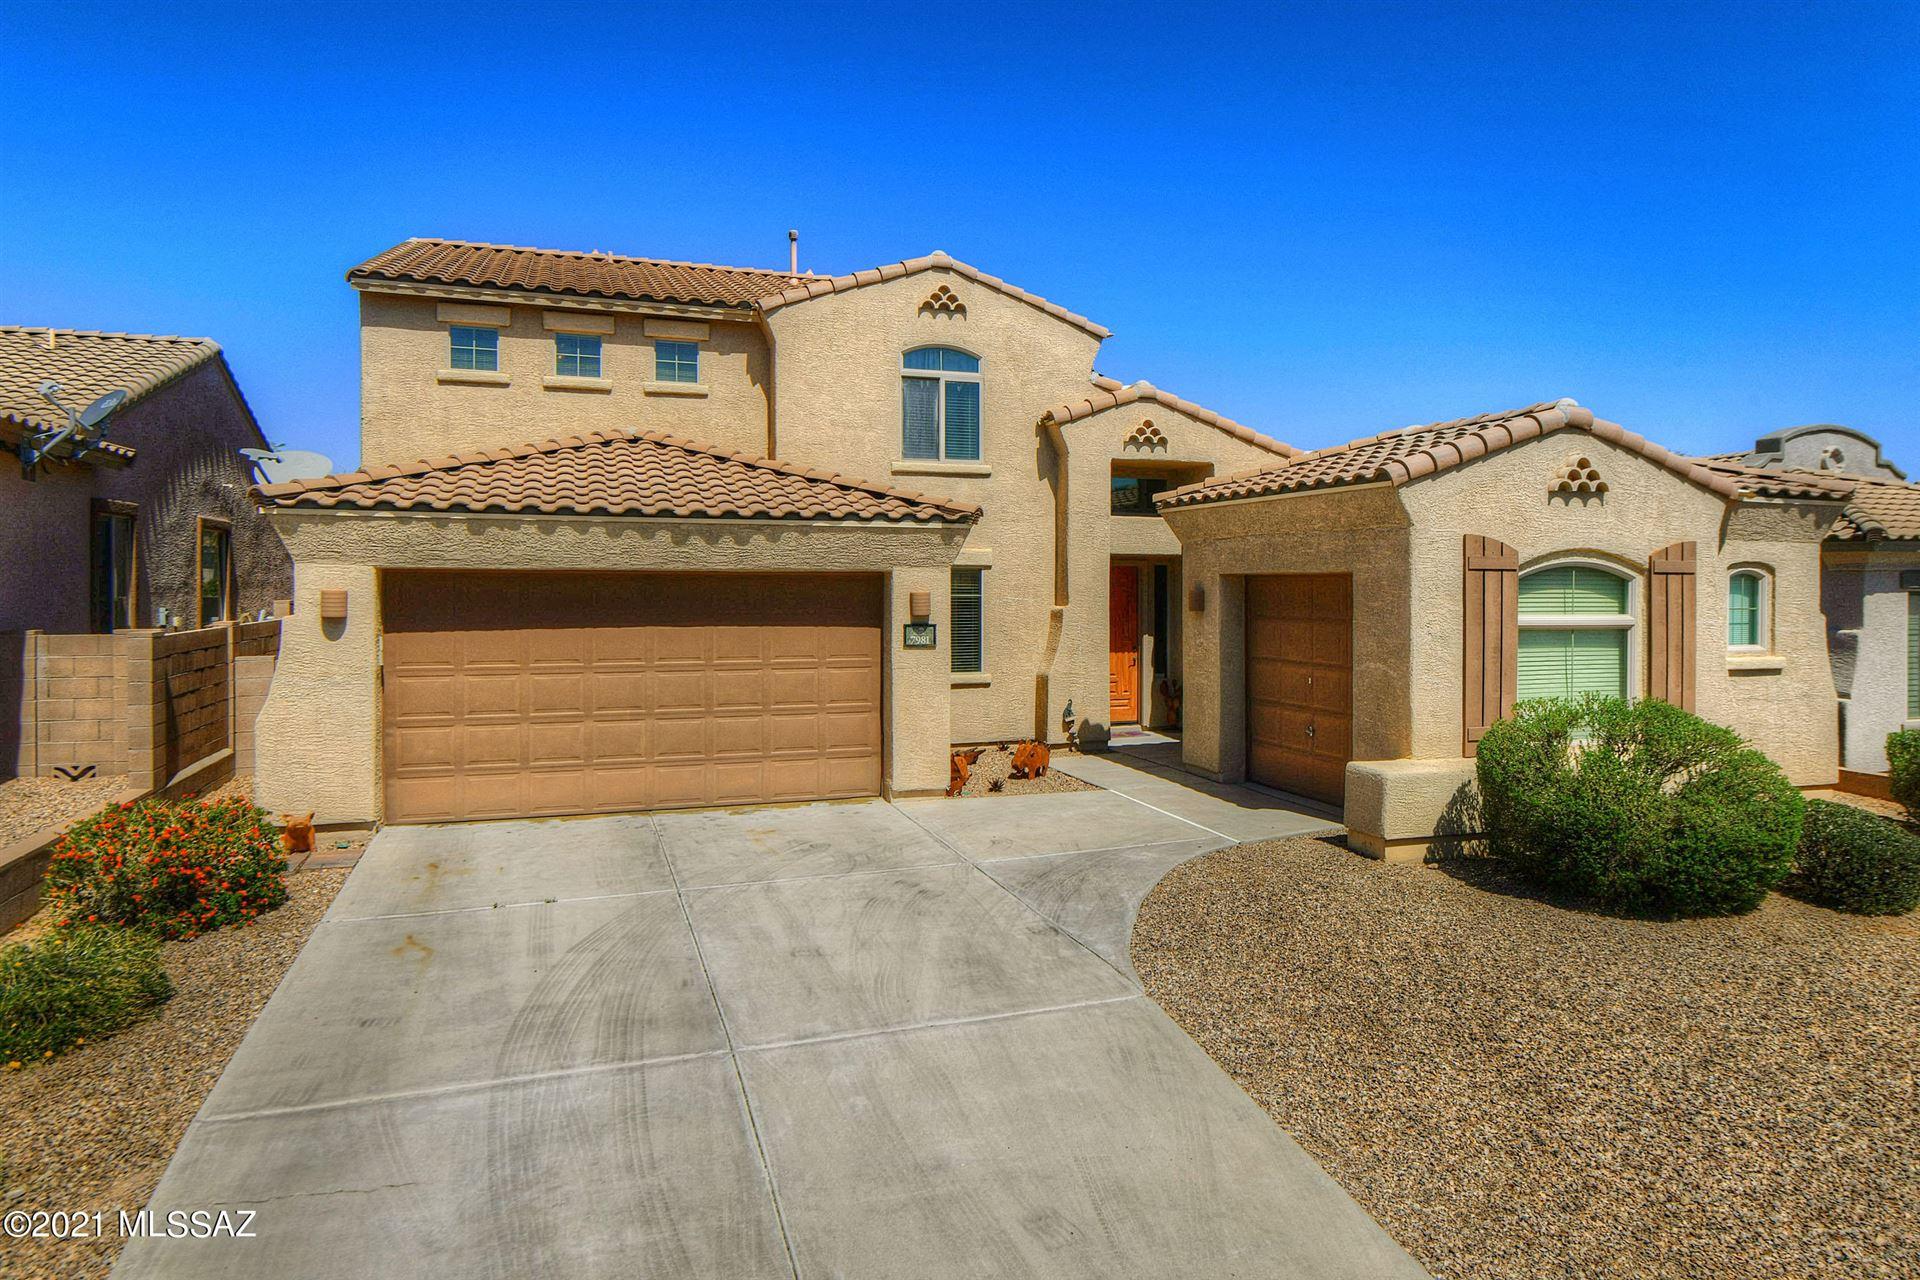 7981 N Wayward Star Drive, Tucson, AZ 85743 - MLS#: 22109515